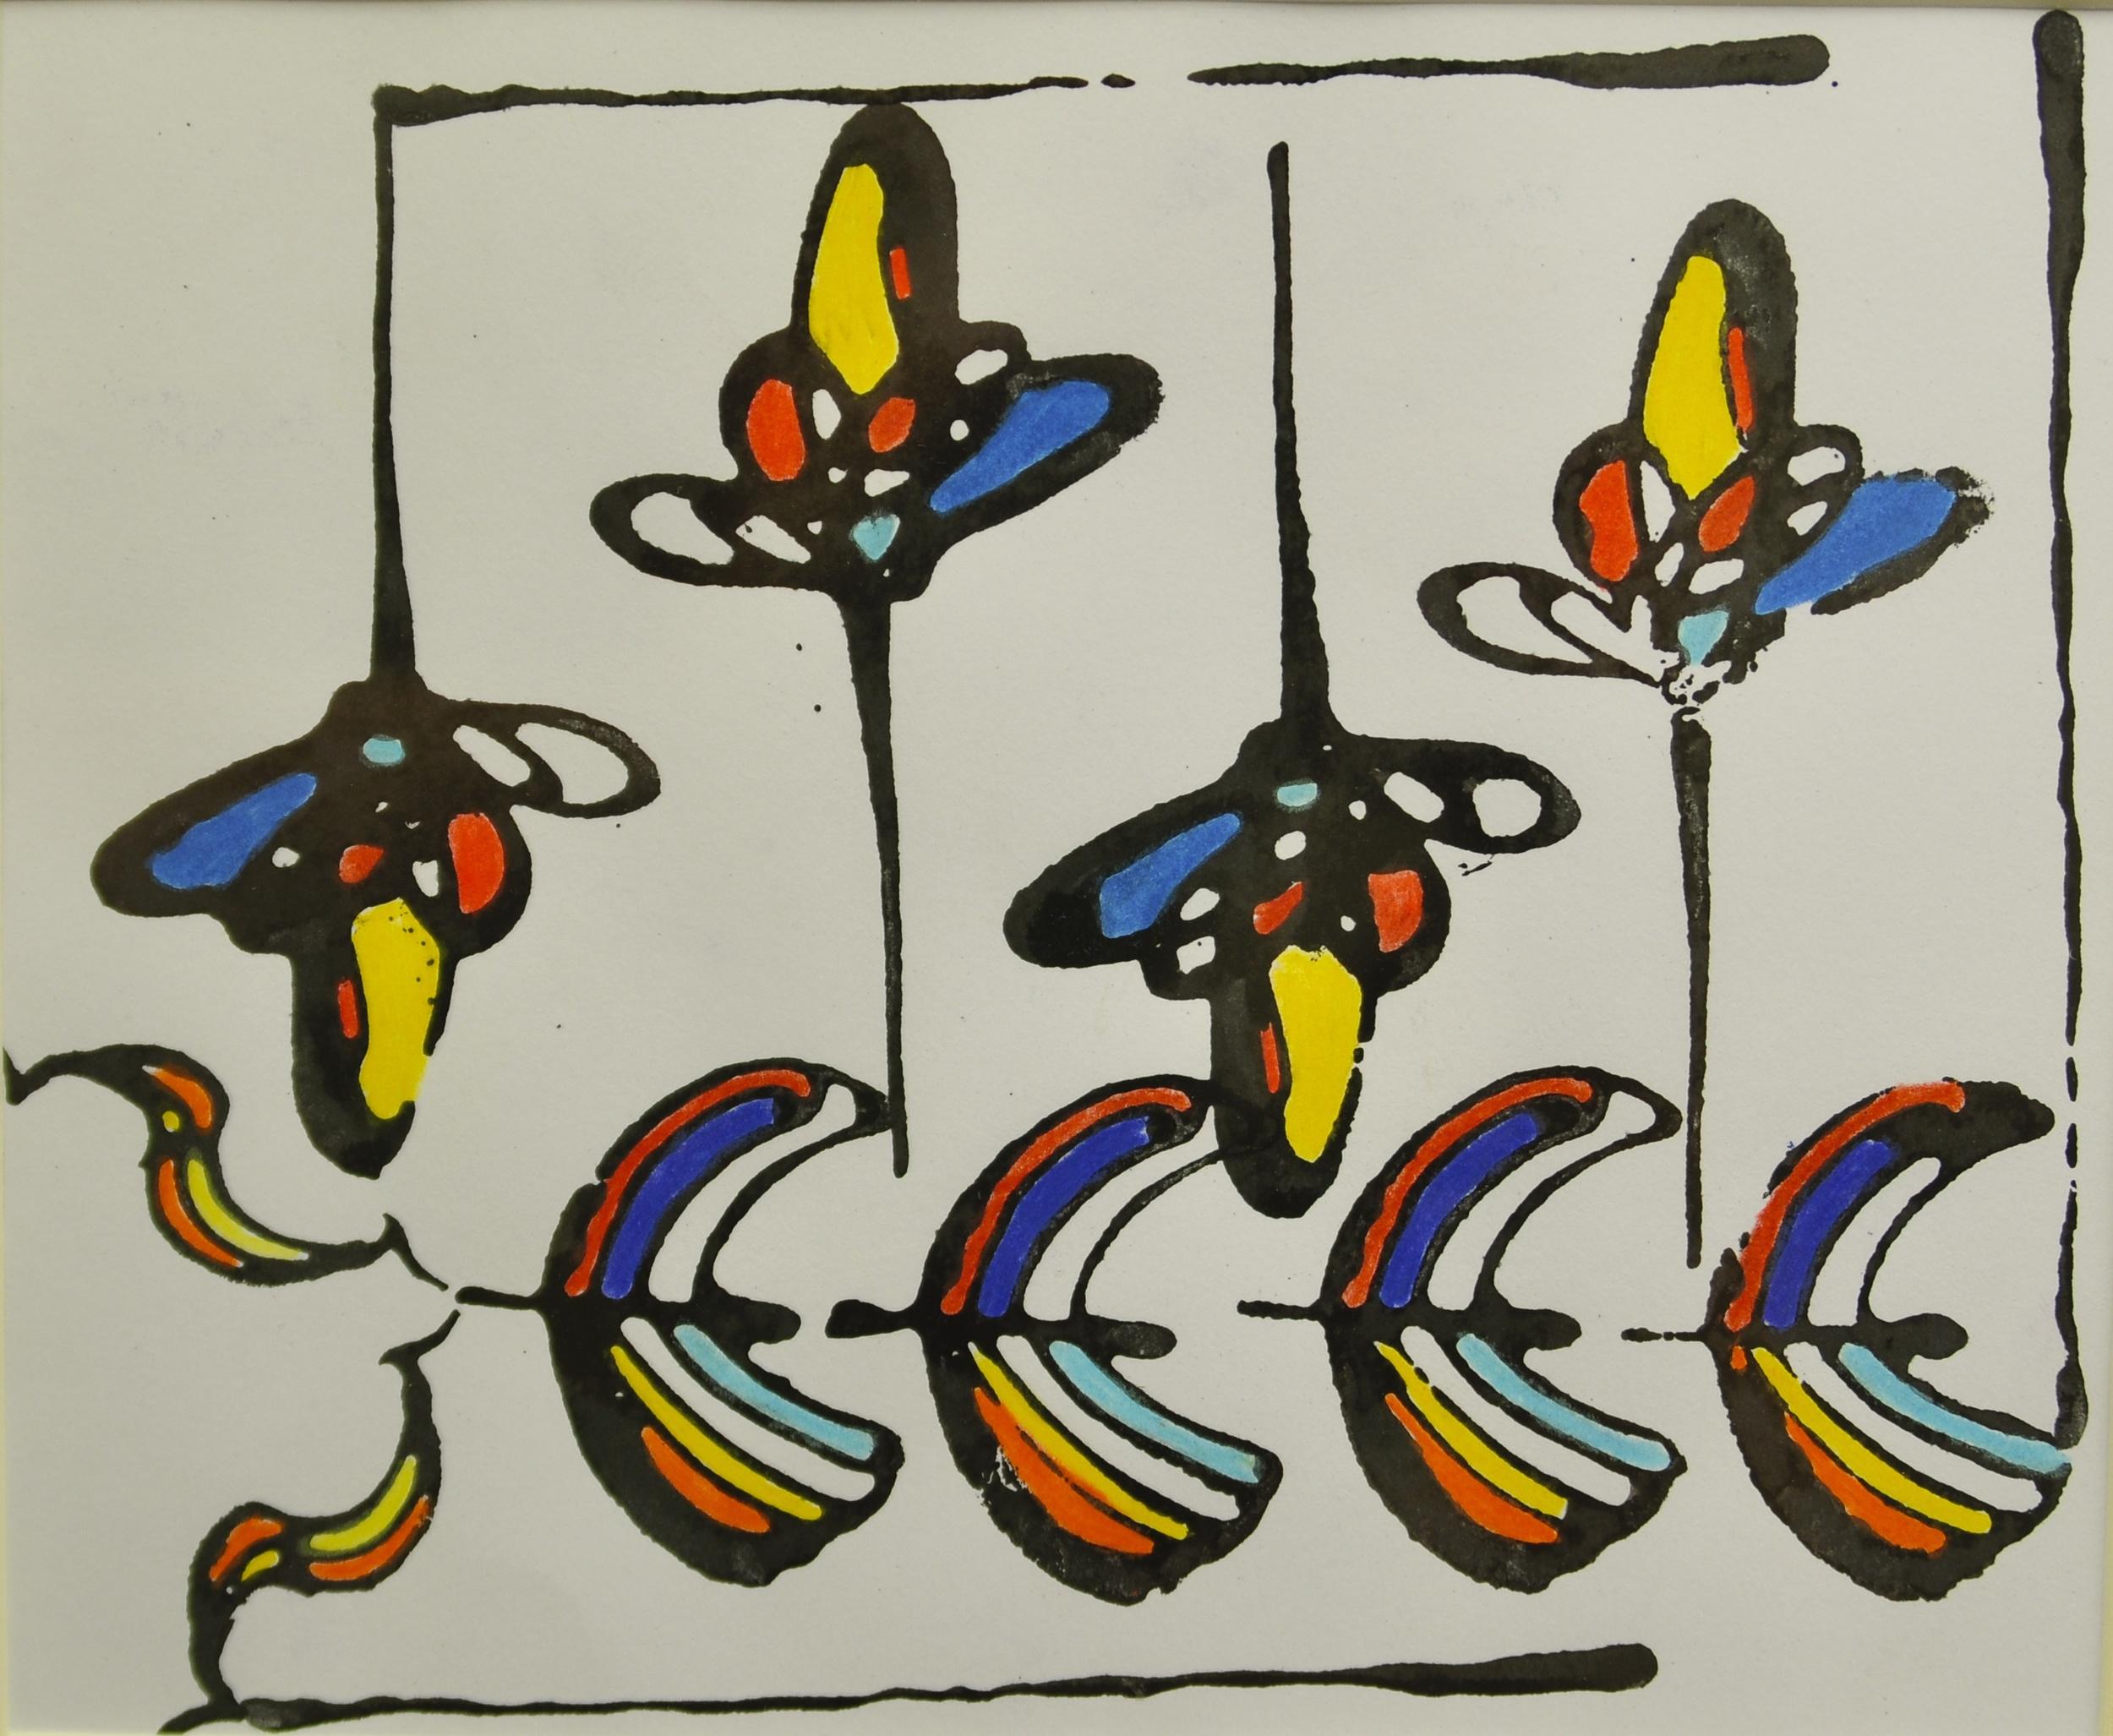 "'Delhi export', handmade paper (Jaipur), block print, colored pencil, 7"" x 7"", 2013"